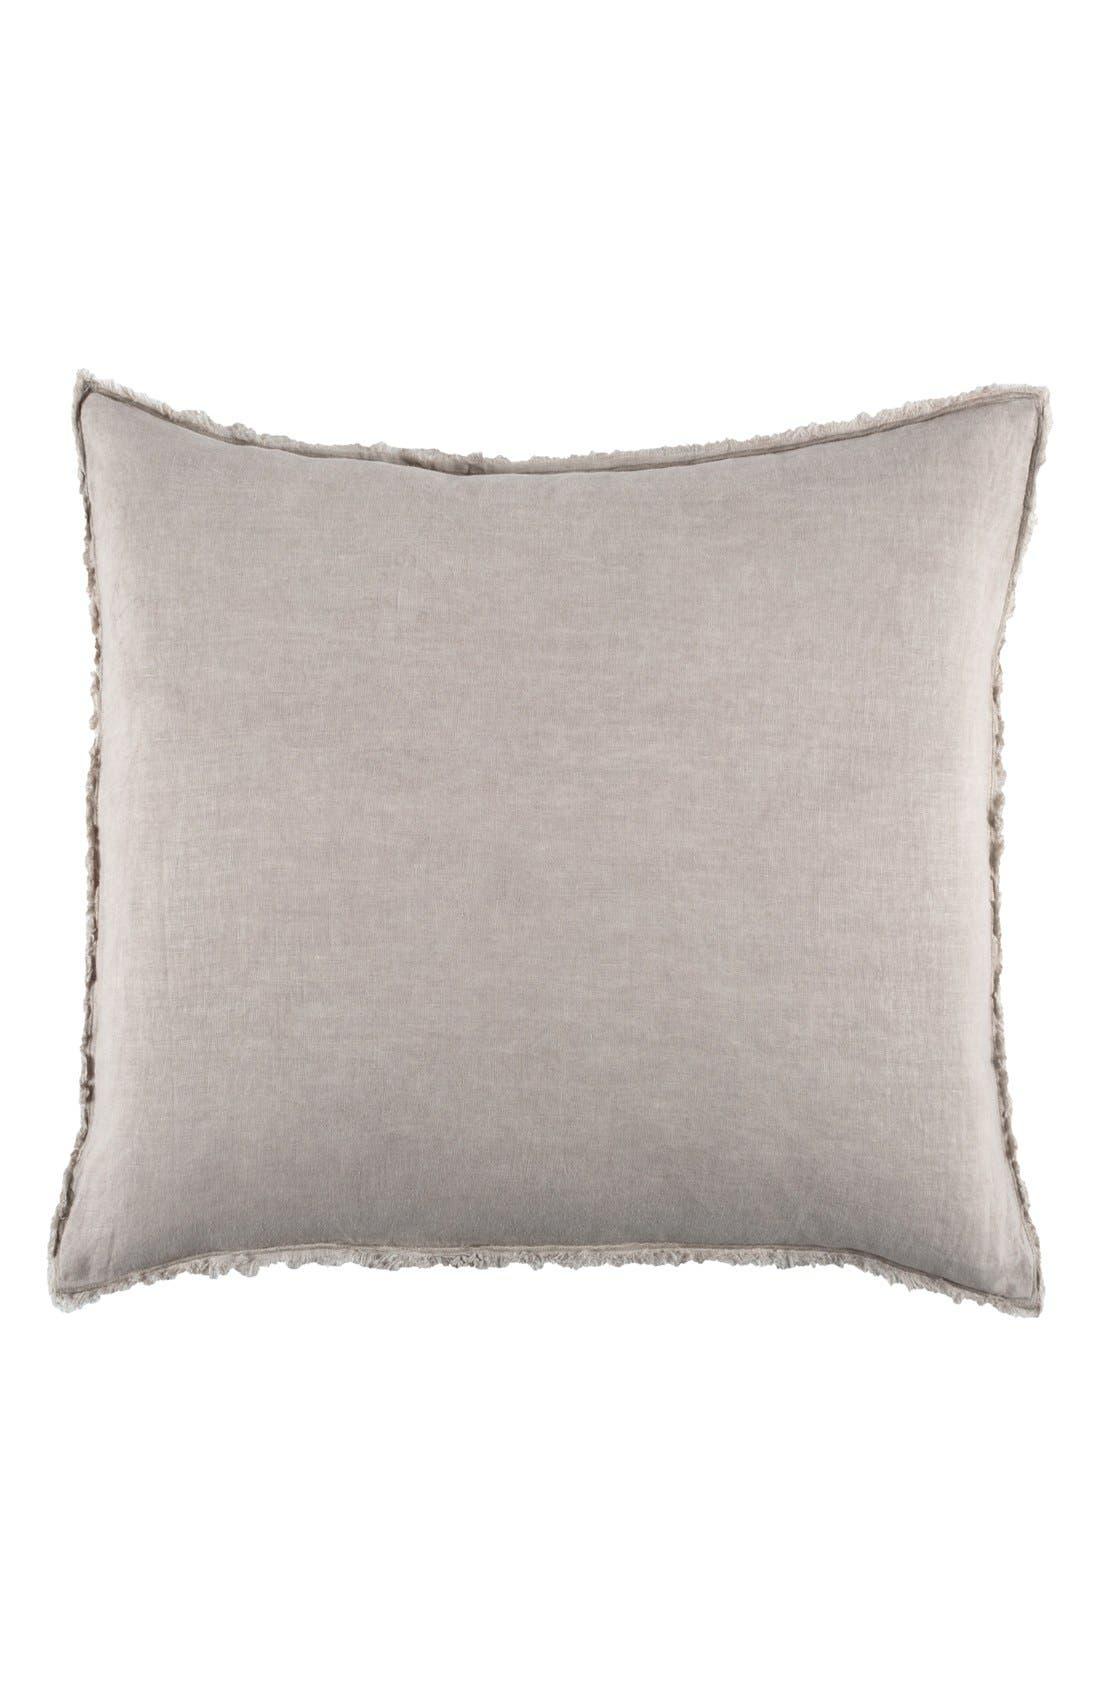 'Blair' Linen Euro Pillow Sham,                             Main thumbnail 1, color,                             Taupe